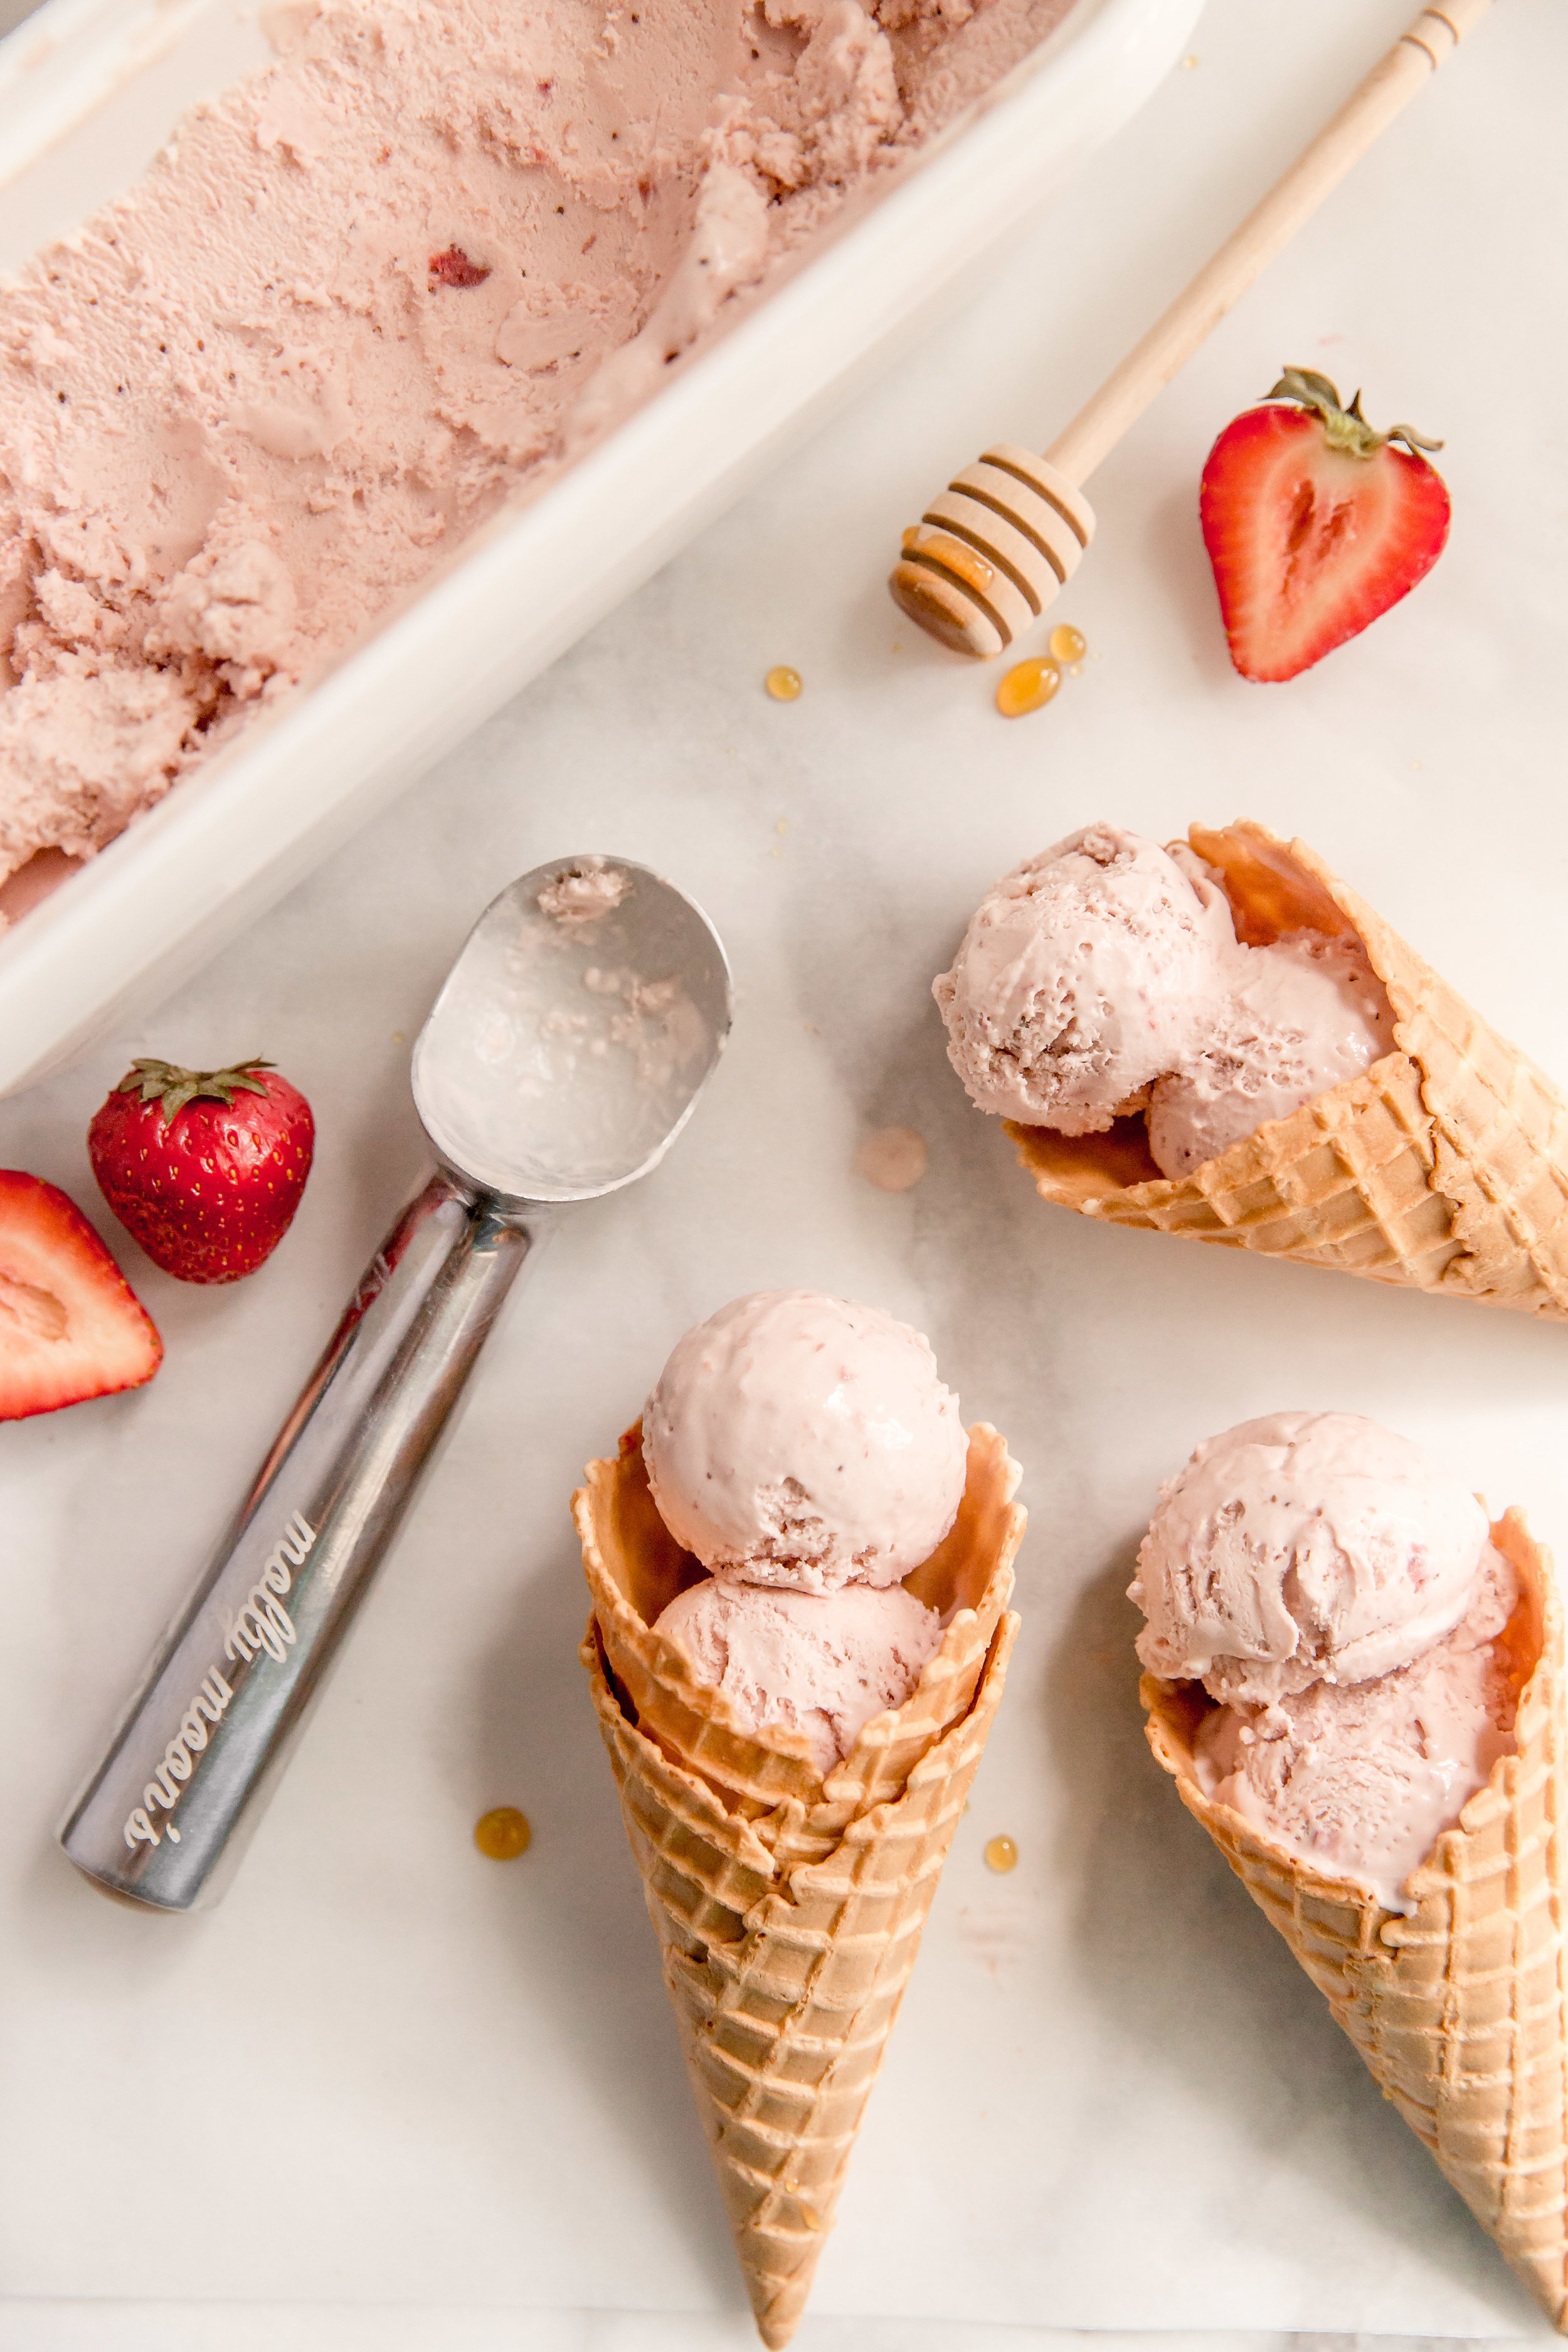 roasted-strawberry-honey-ice-cream-12.jpg